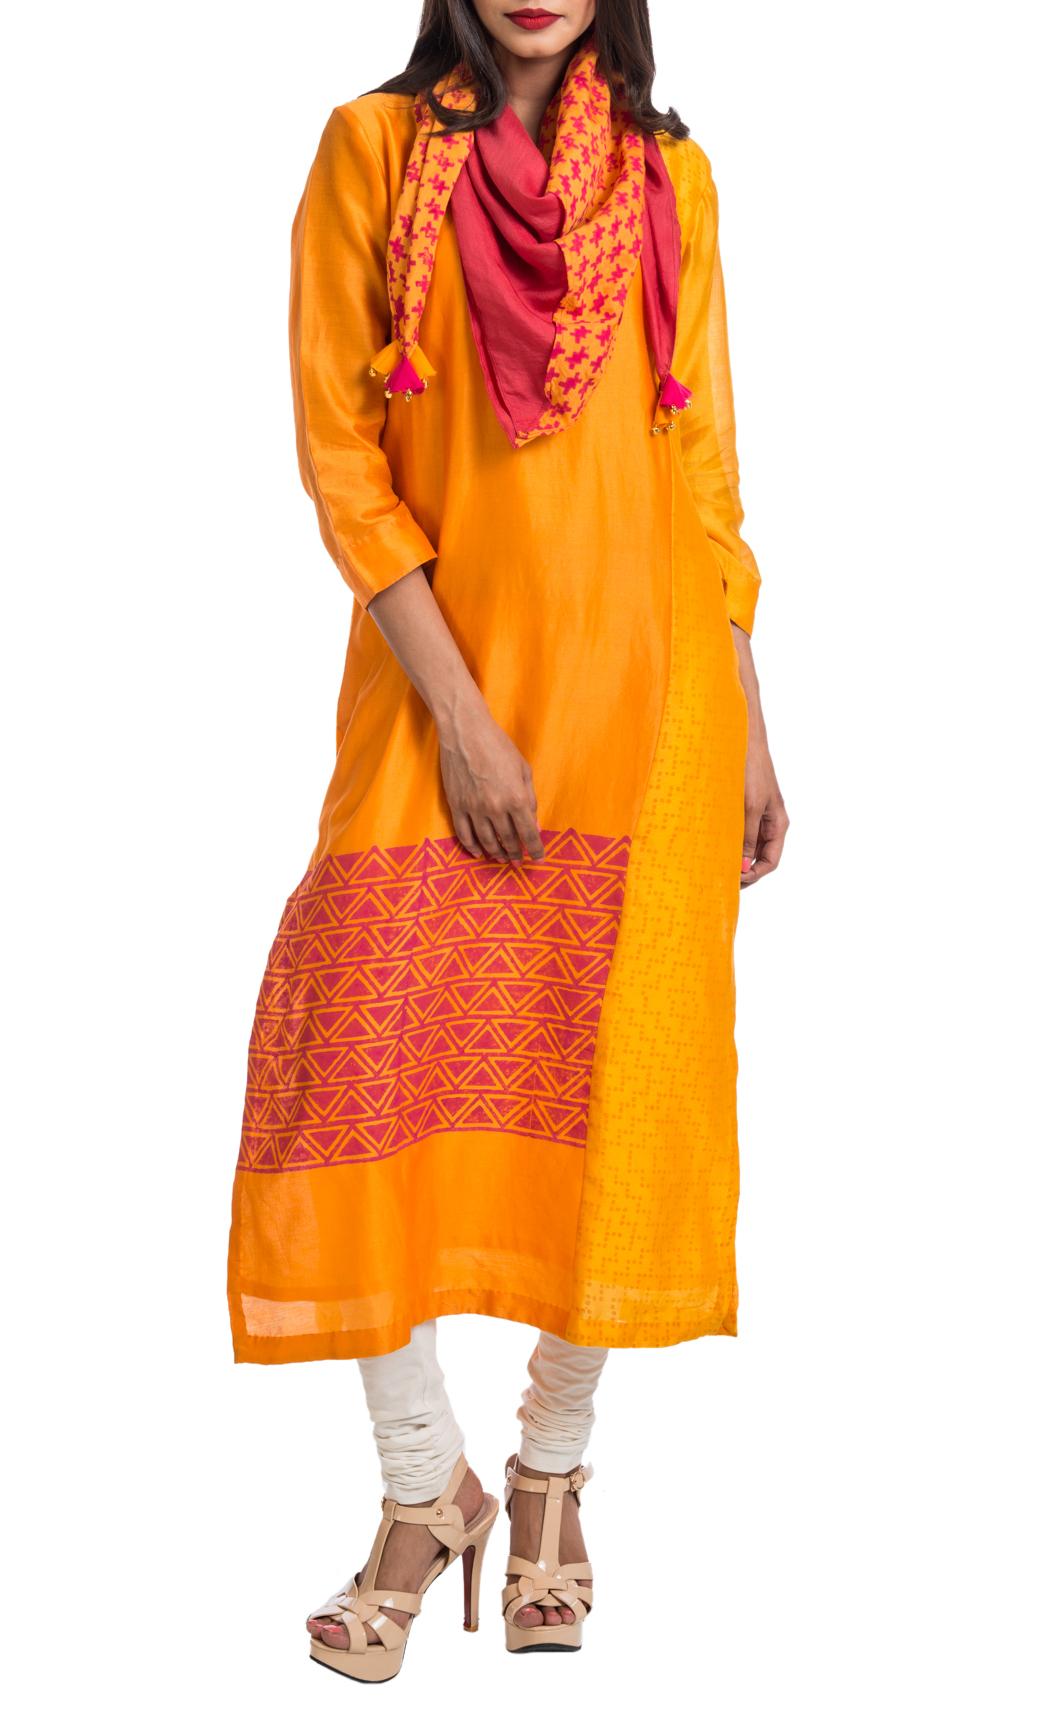 Mango and Orange Textured Panel Tunic - Shop Online